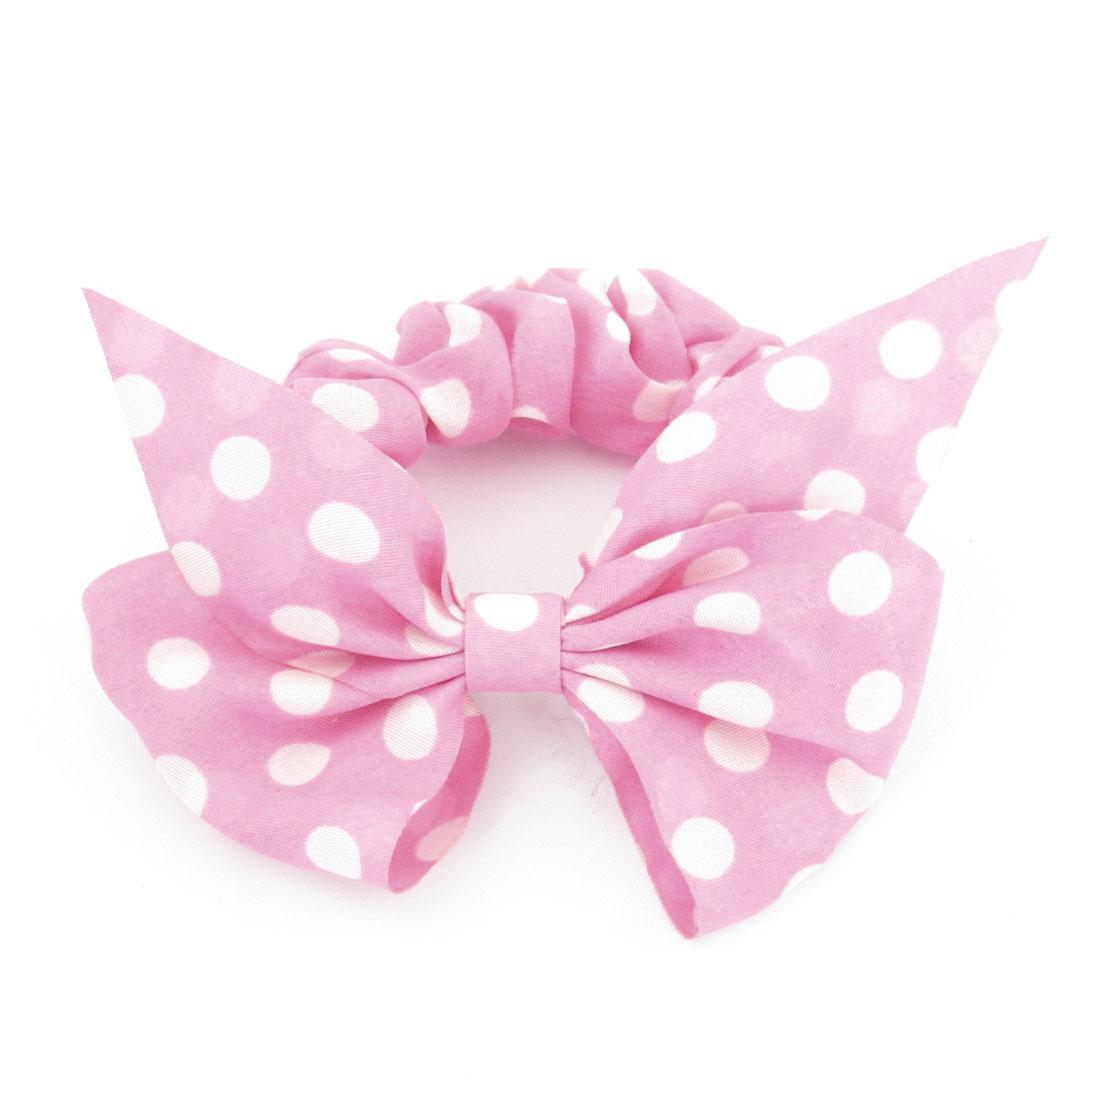 Girls White Polka Dot Bowknot Pattern Elastic Band Ponytail Holder Pink